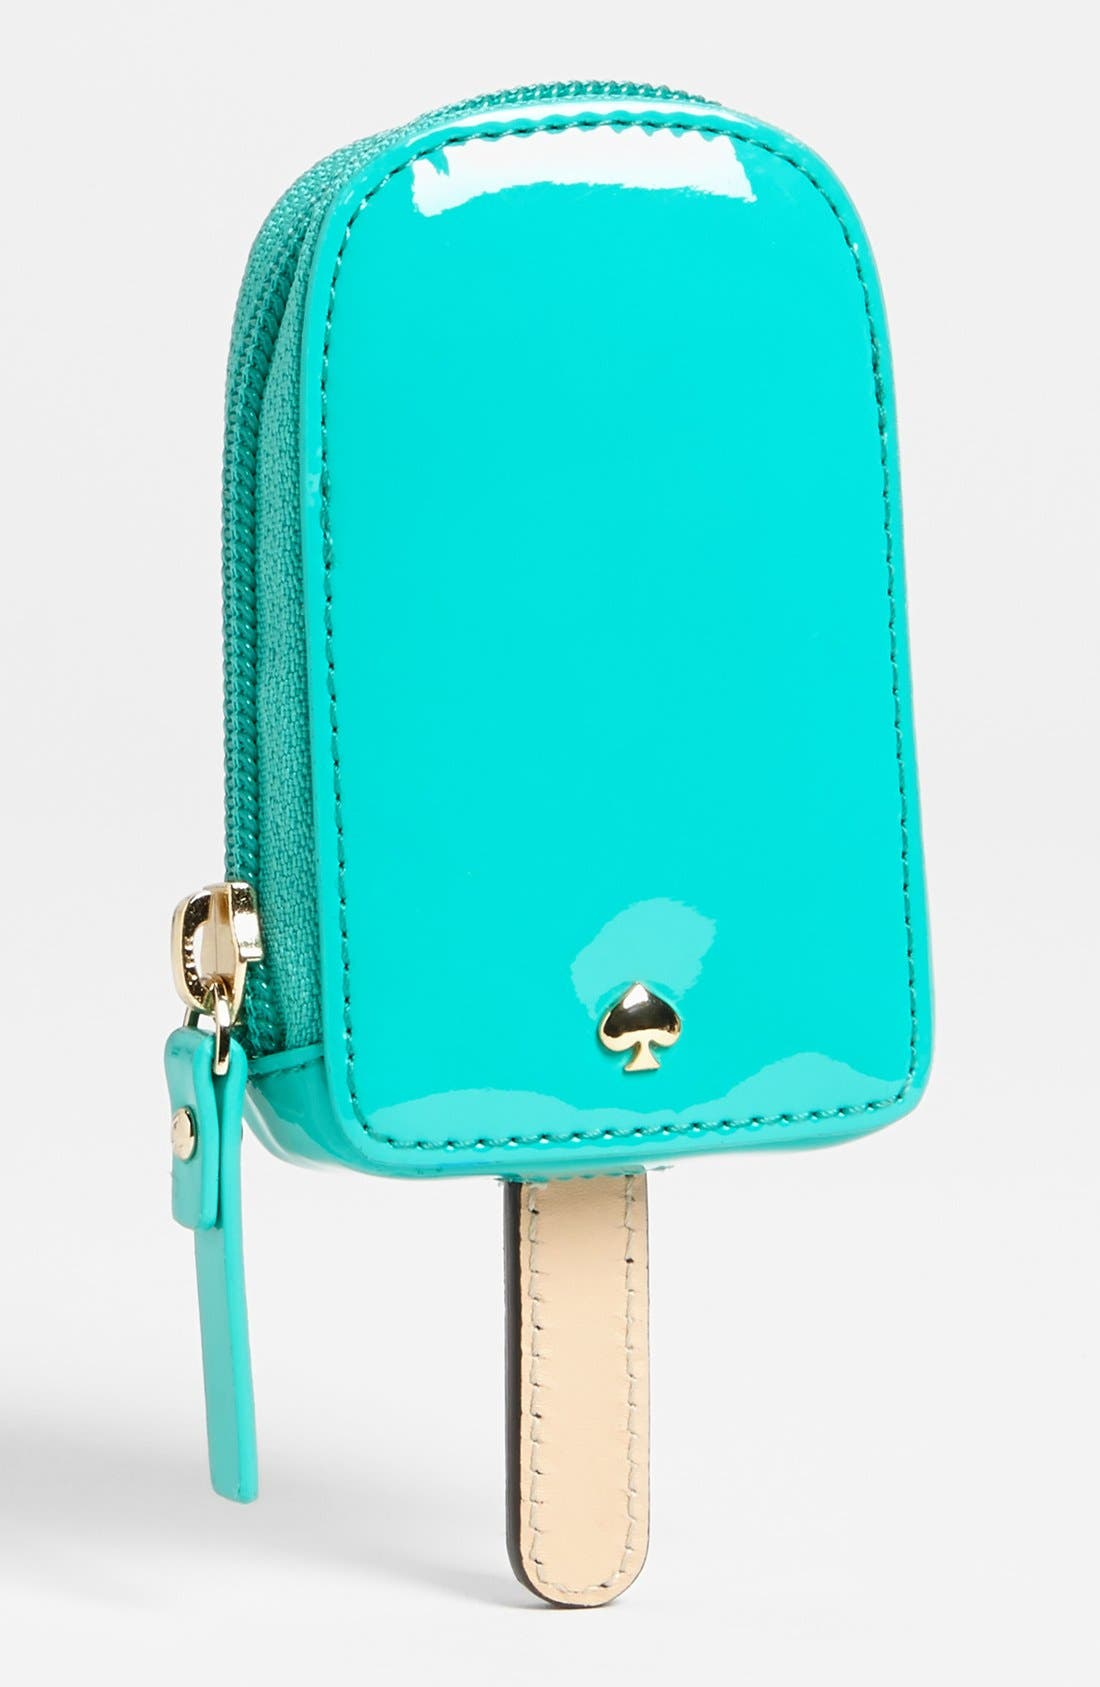 'popsicle' coin purse, Main, color, 383